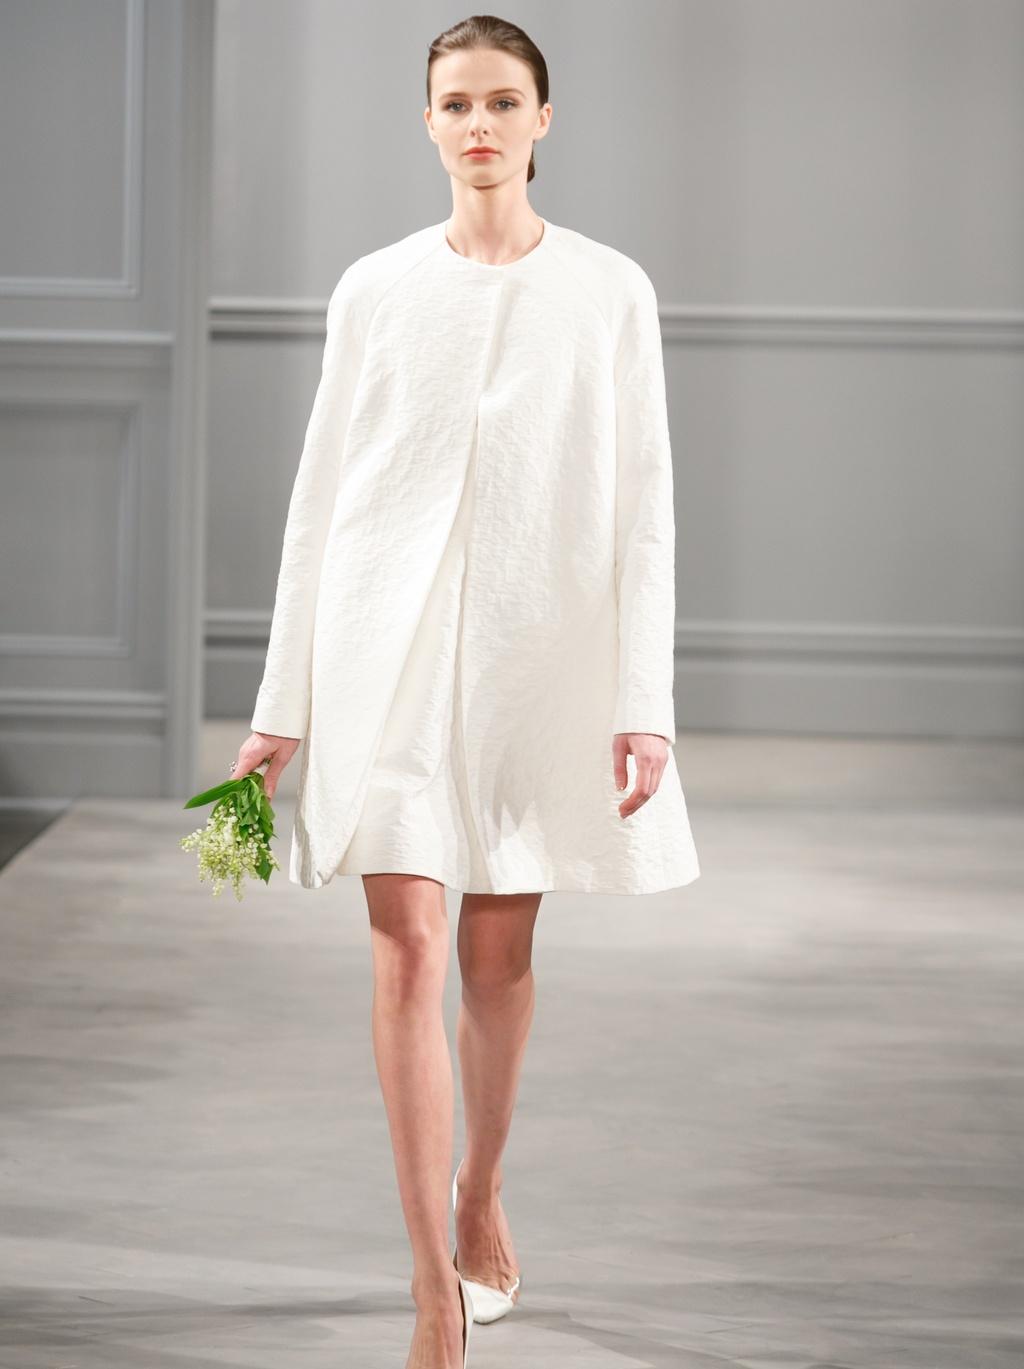 Spring-2014-wedding-dress-monique-lhuillier-bridal-dee.full